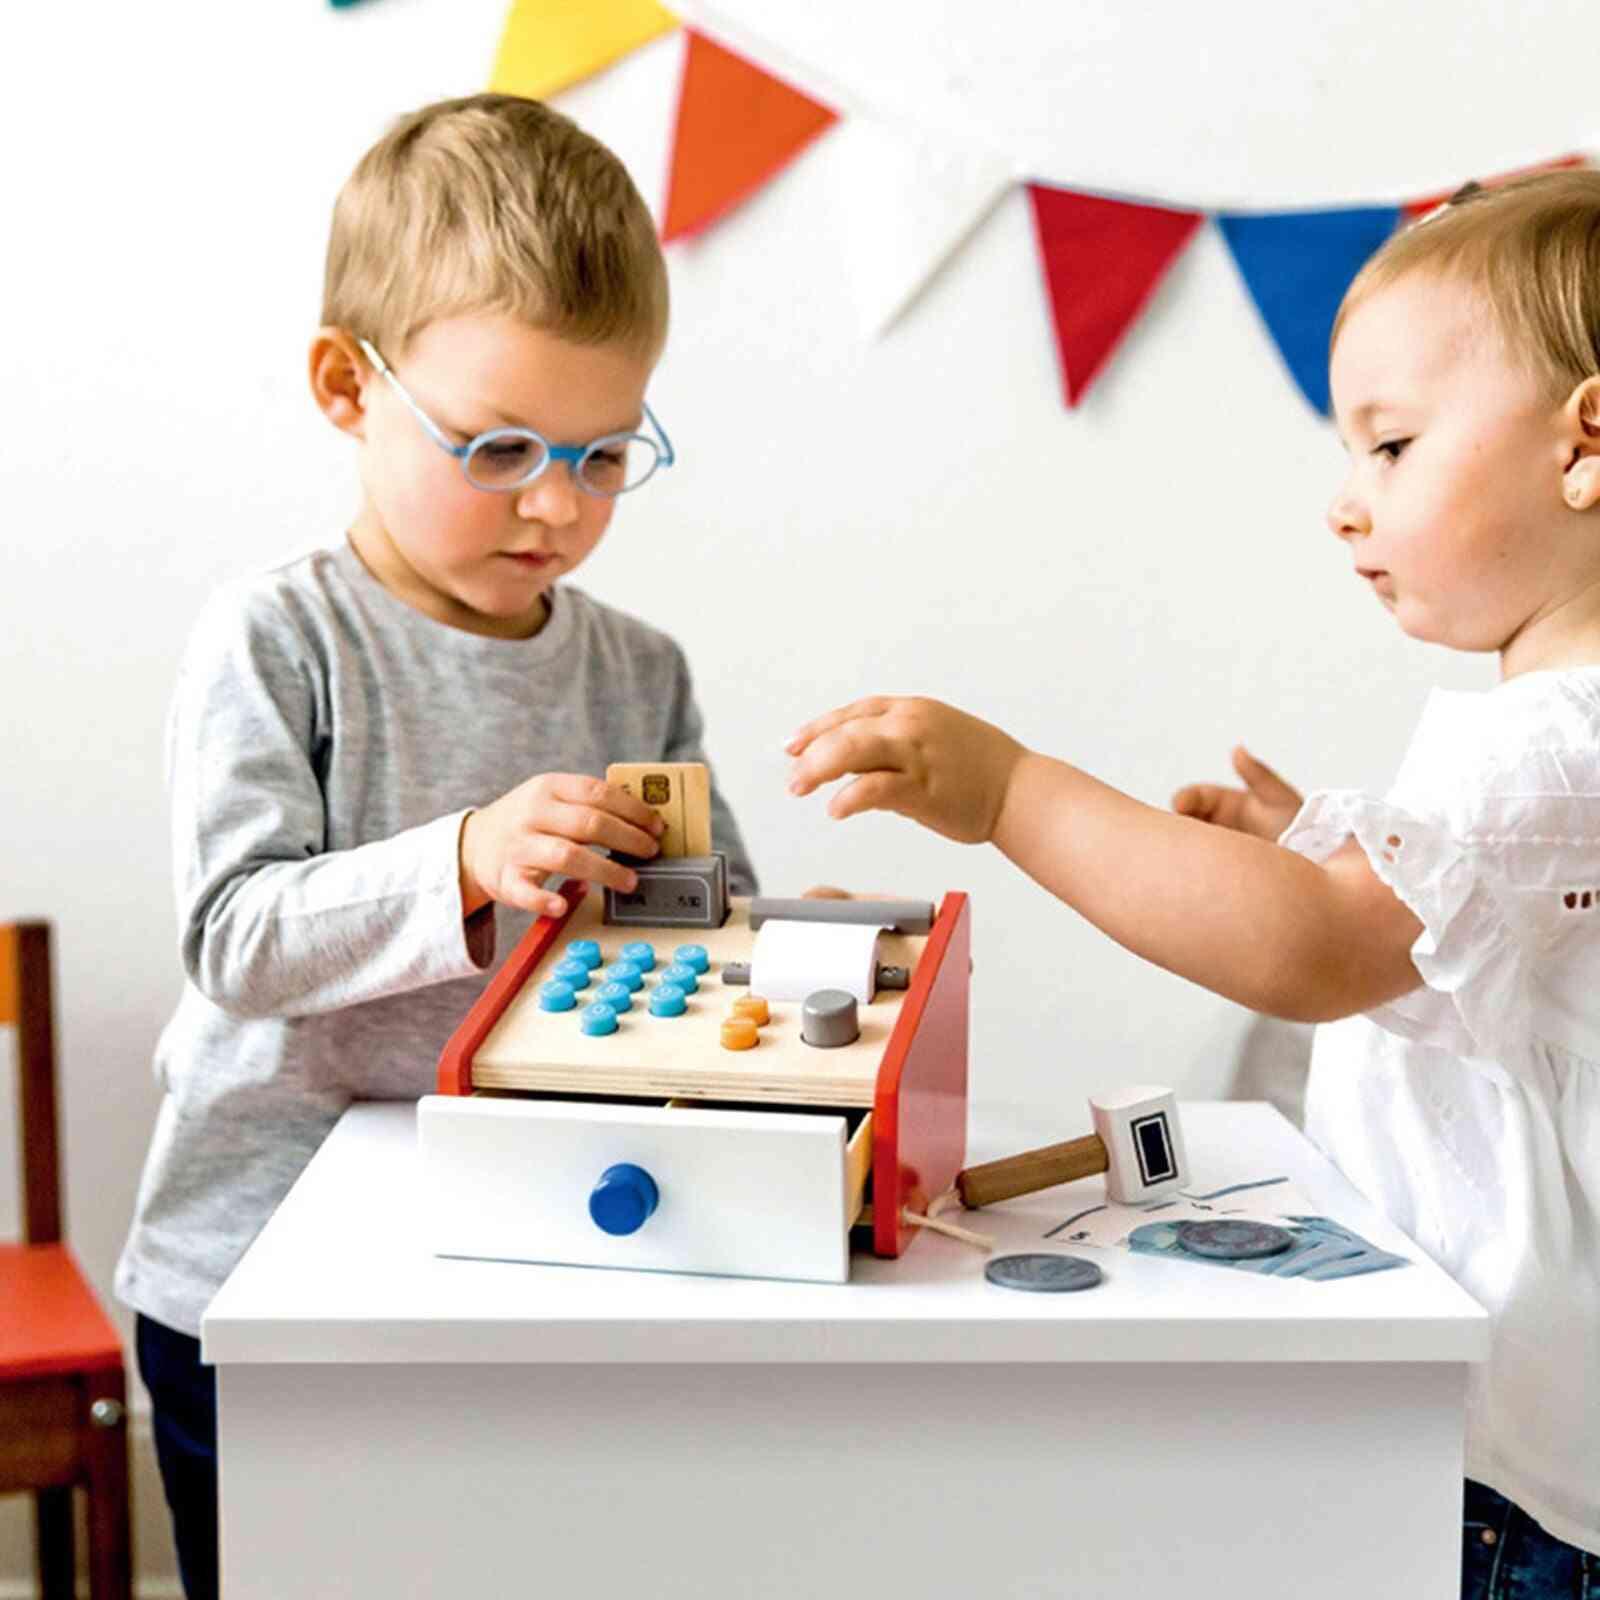 Wooden Cash Register, Pretend Supermarket Cashier Play, House Toy